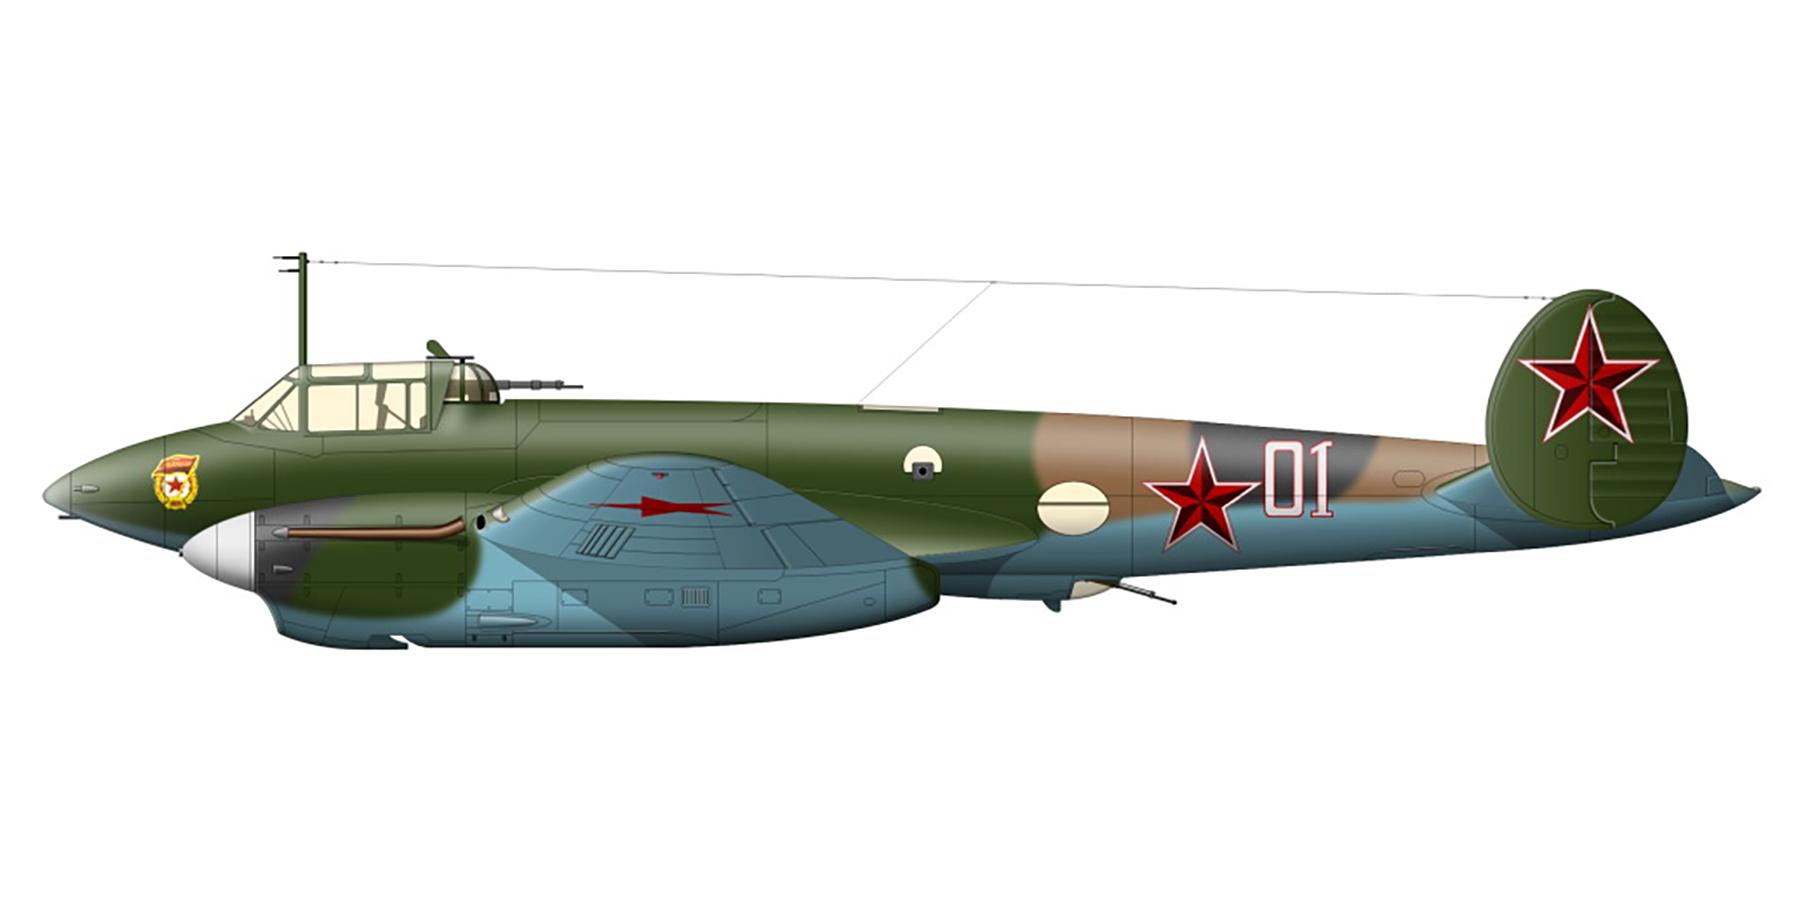 Petlyakov Pe 2 type 110 with 12GvPAP unit no 01 Feb 1944 45 0A